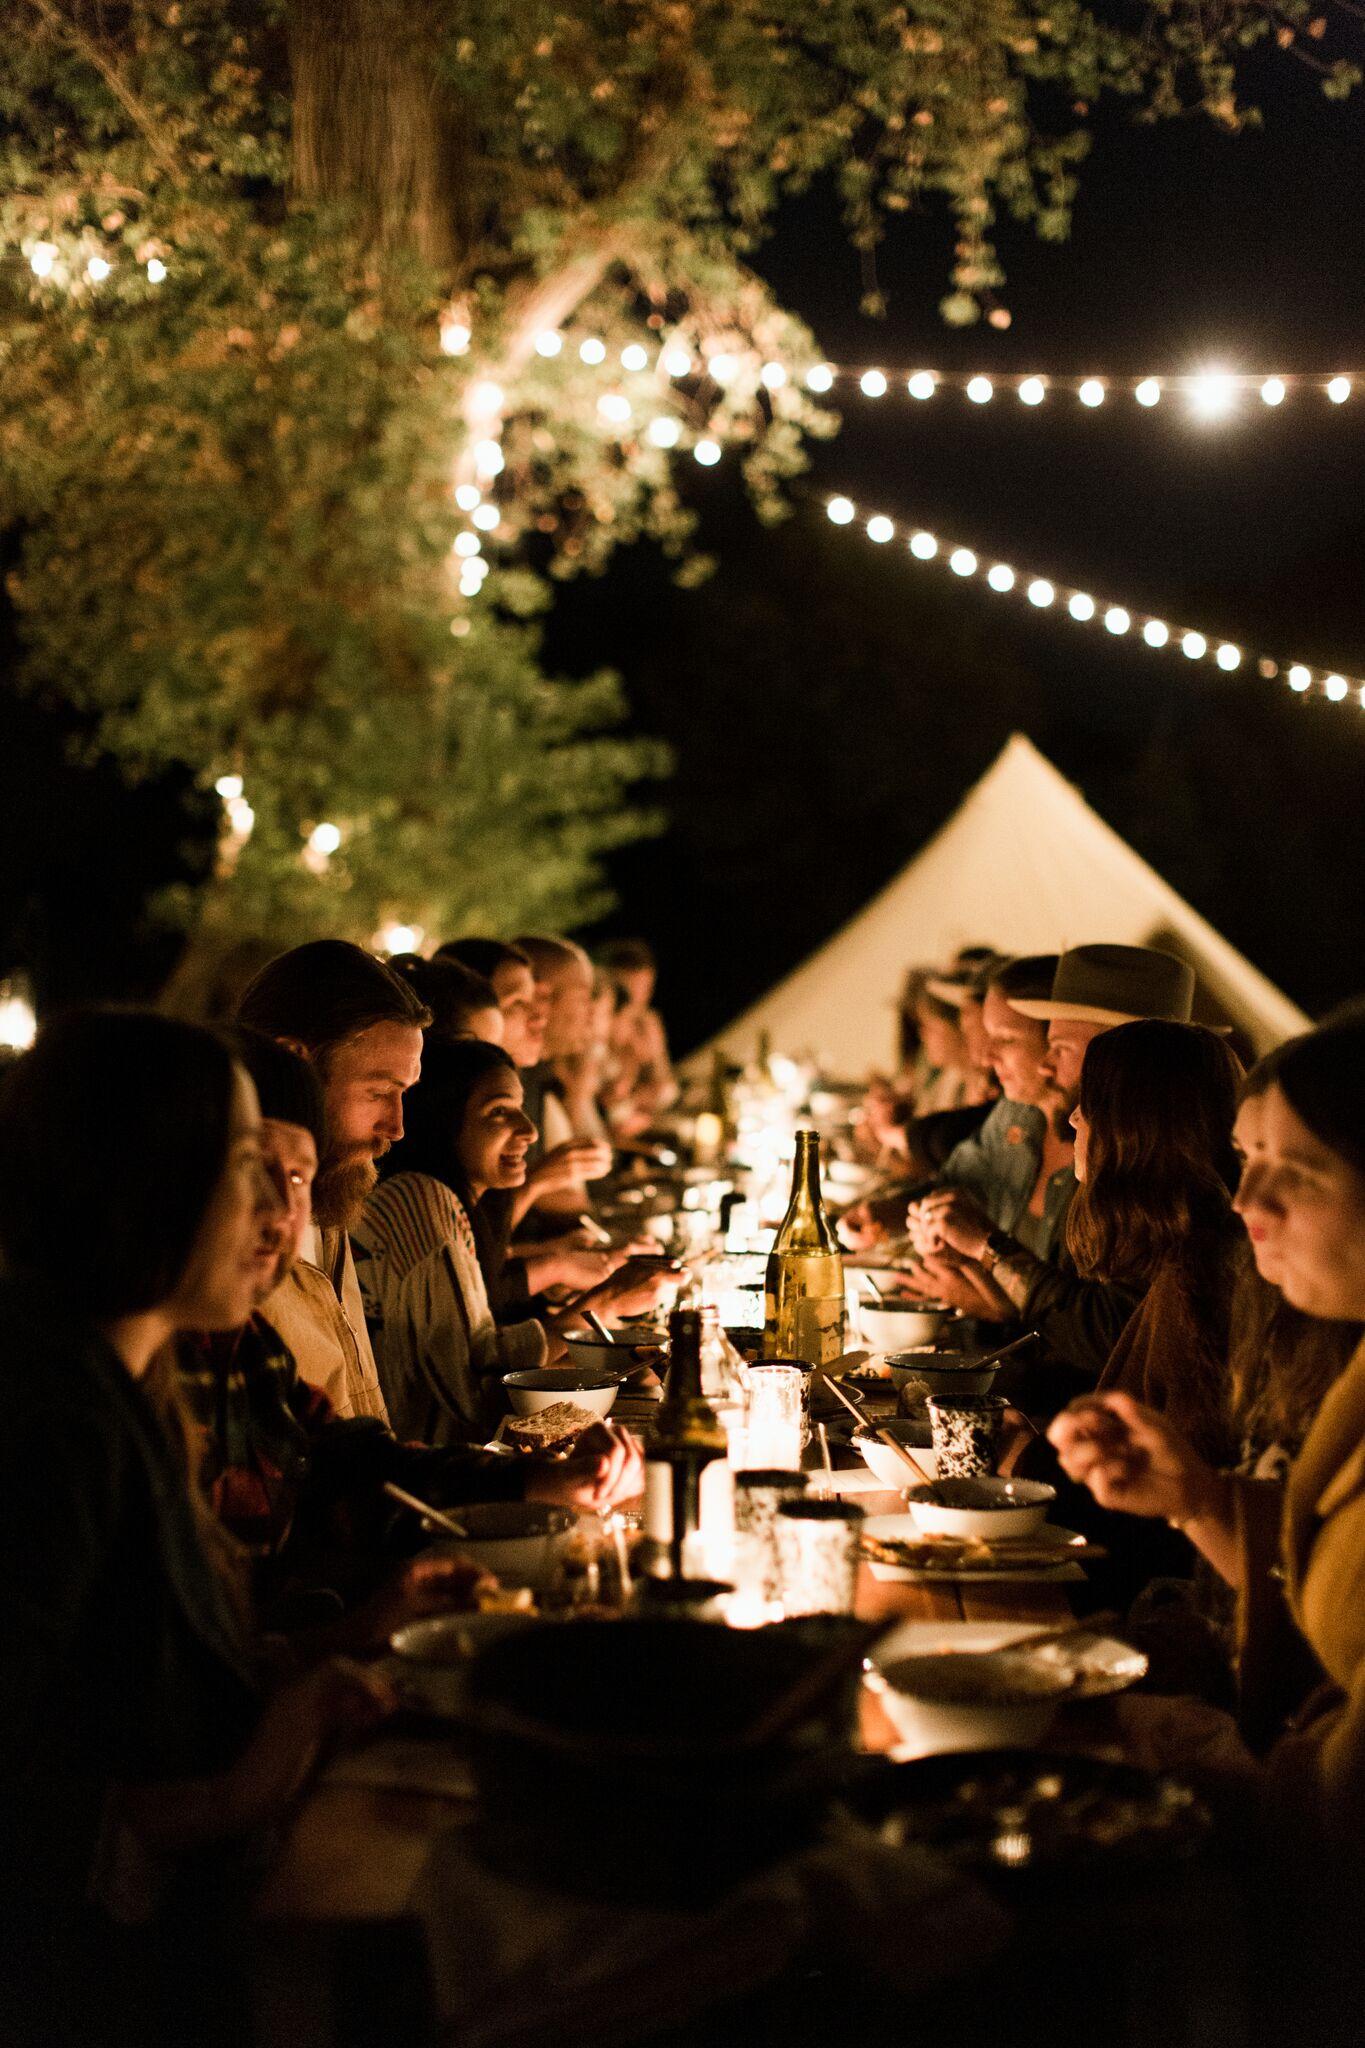 citnb-friendsgiving-feast-24